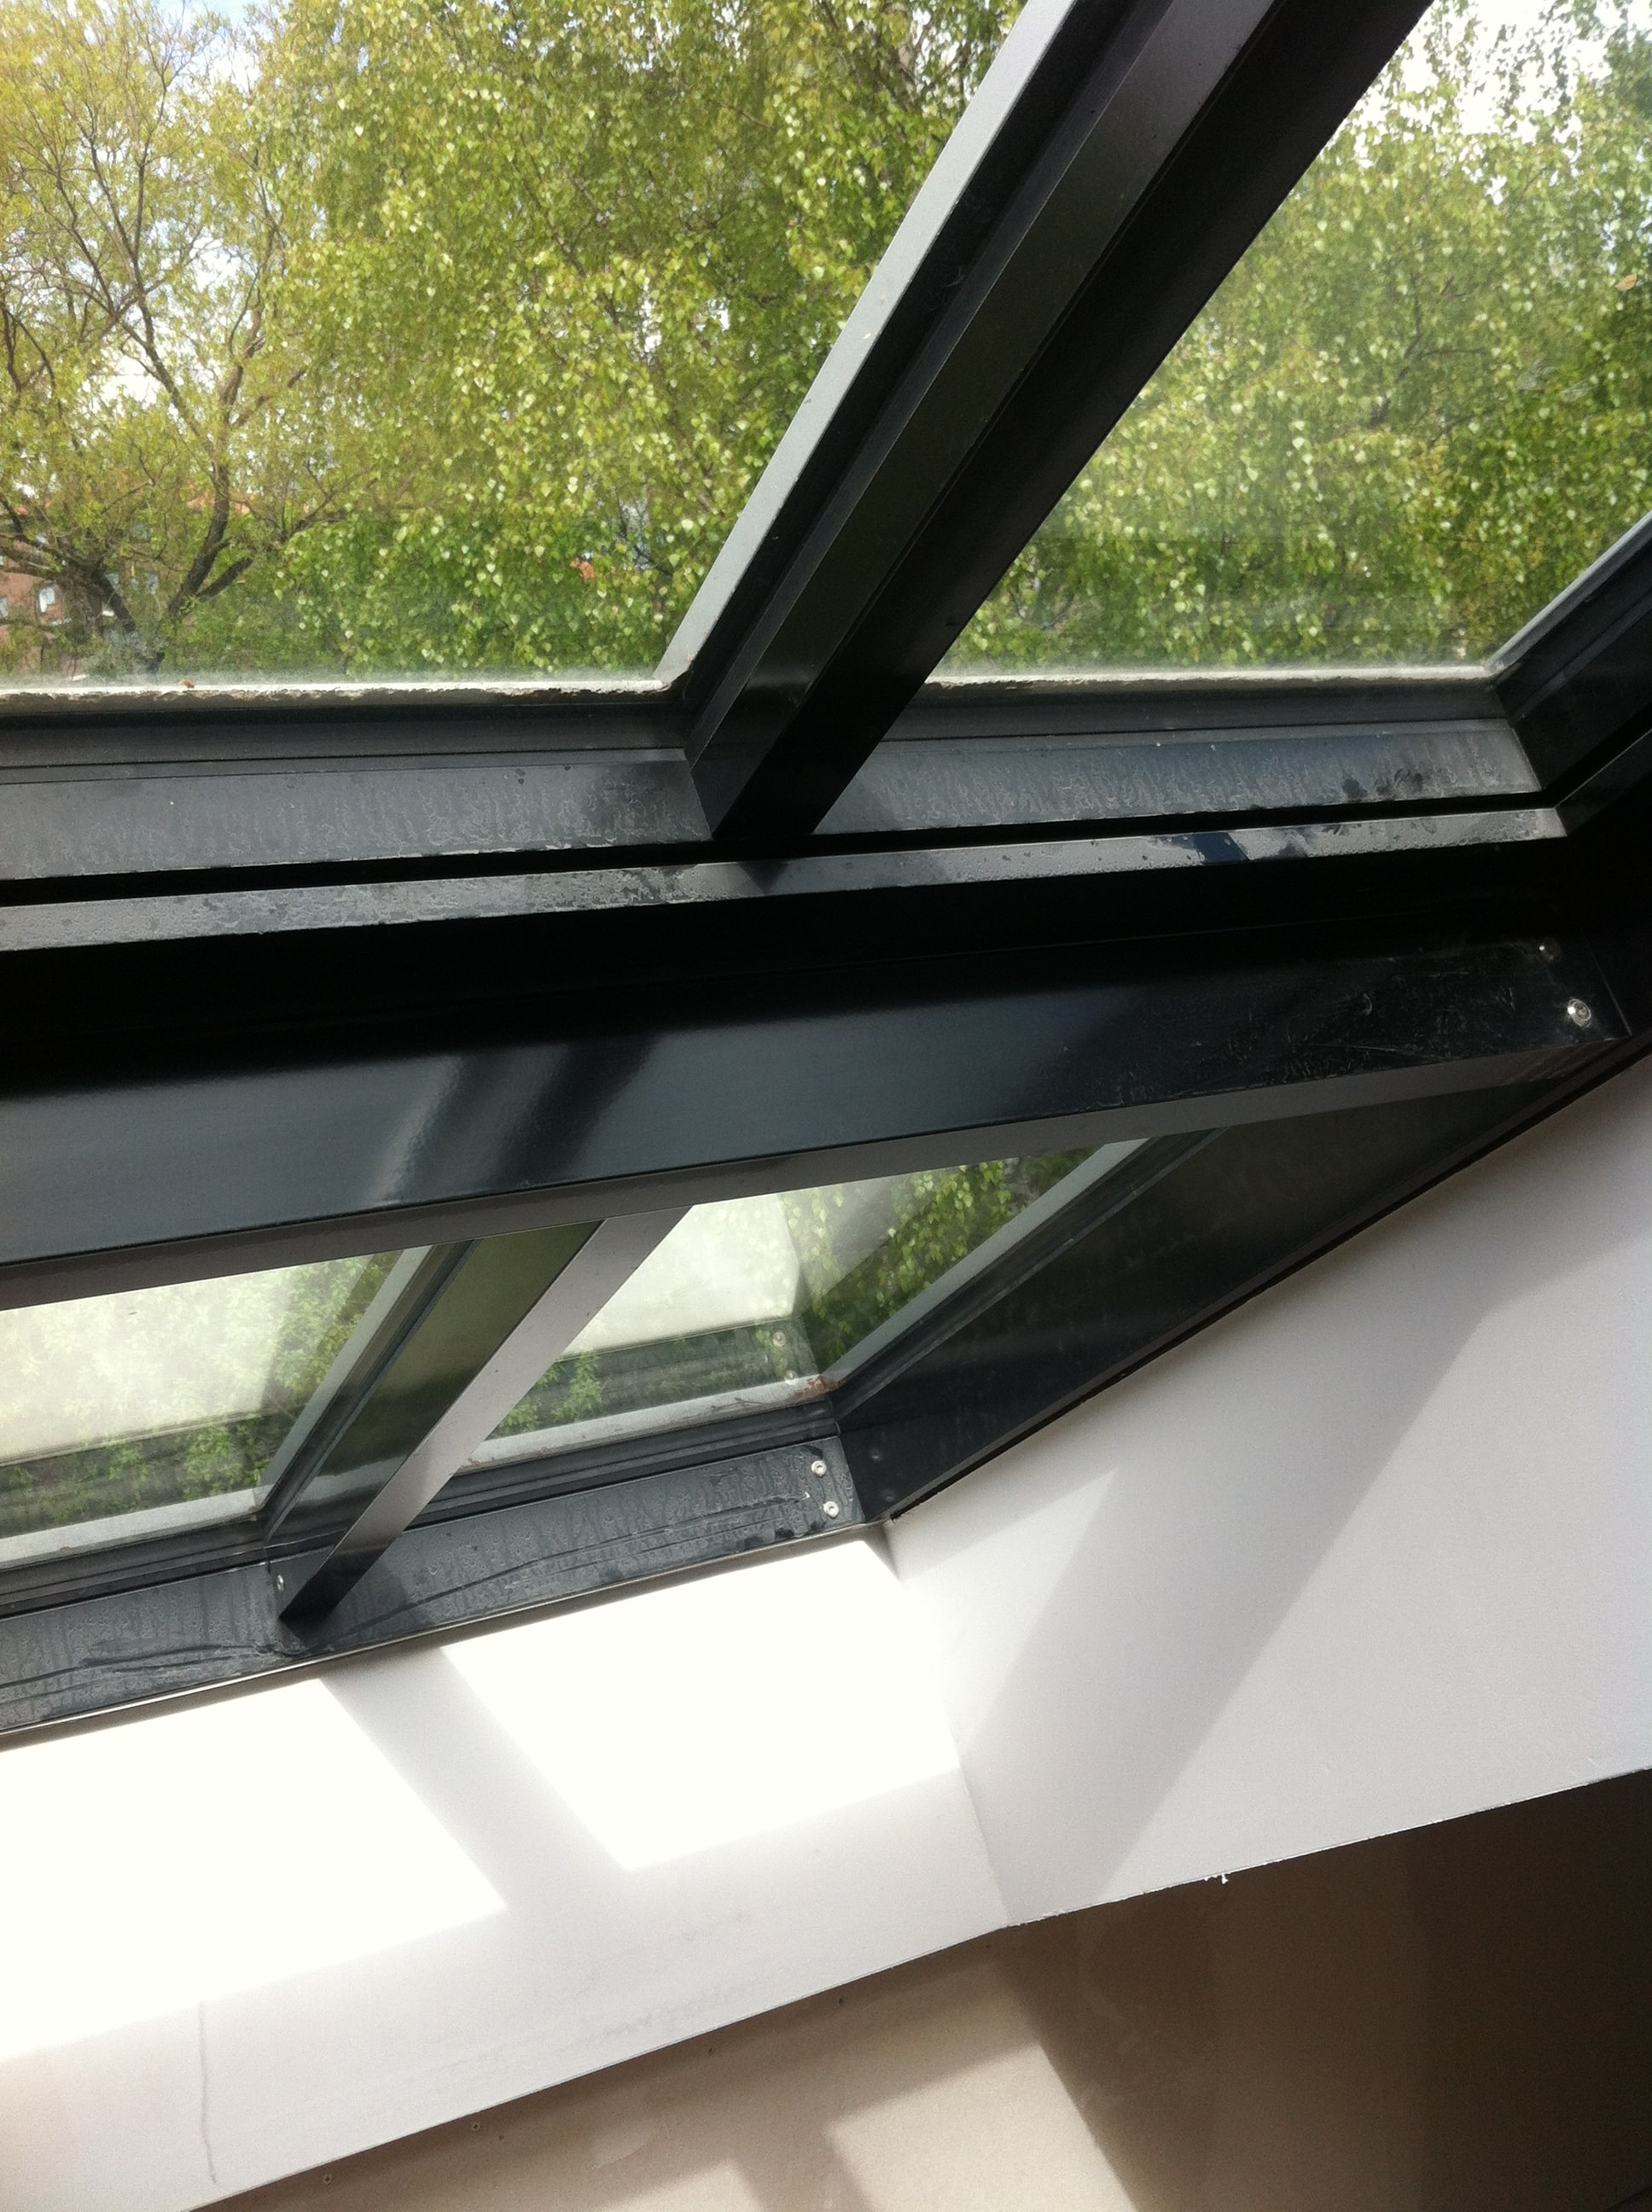 midos rooflights dark window